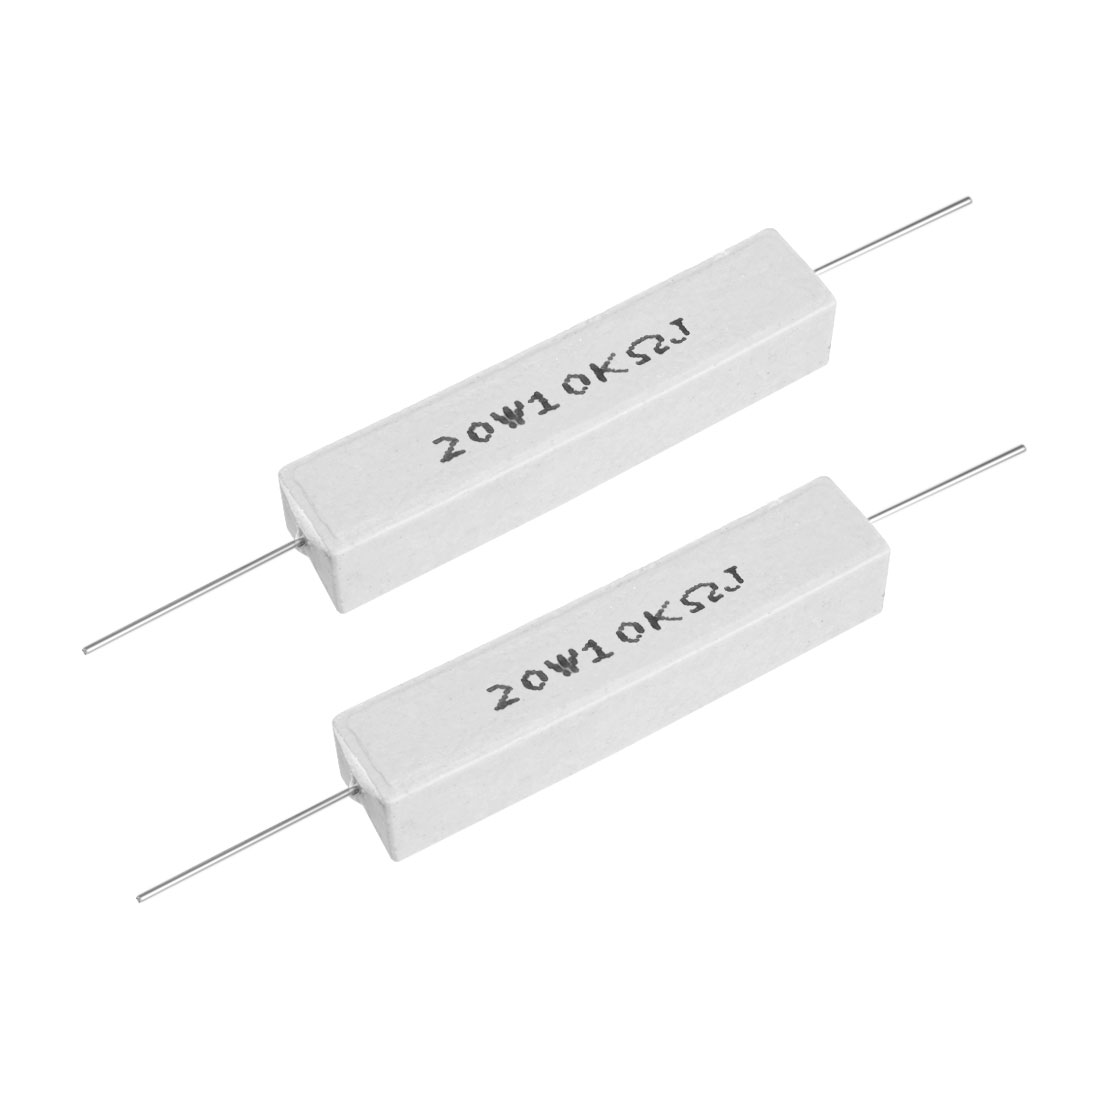 20W 10k Ohm Power Resistor Ceramic Cement Resistor Axial Lead White 2pcs